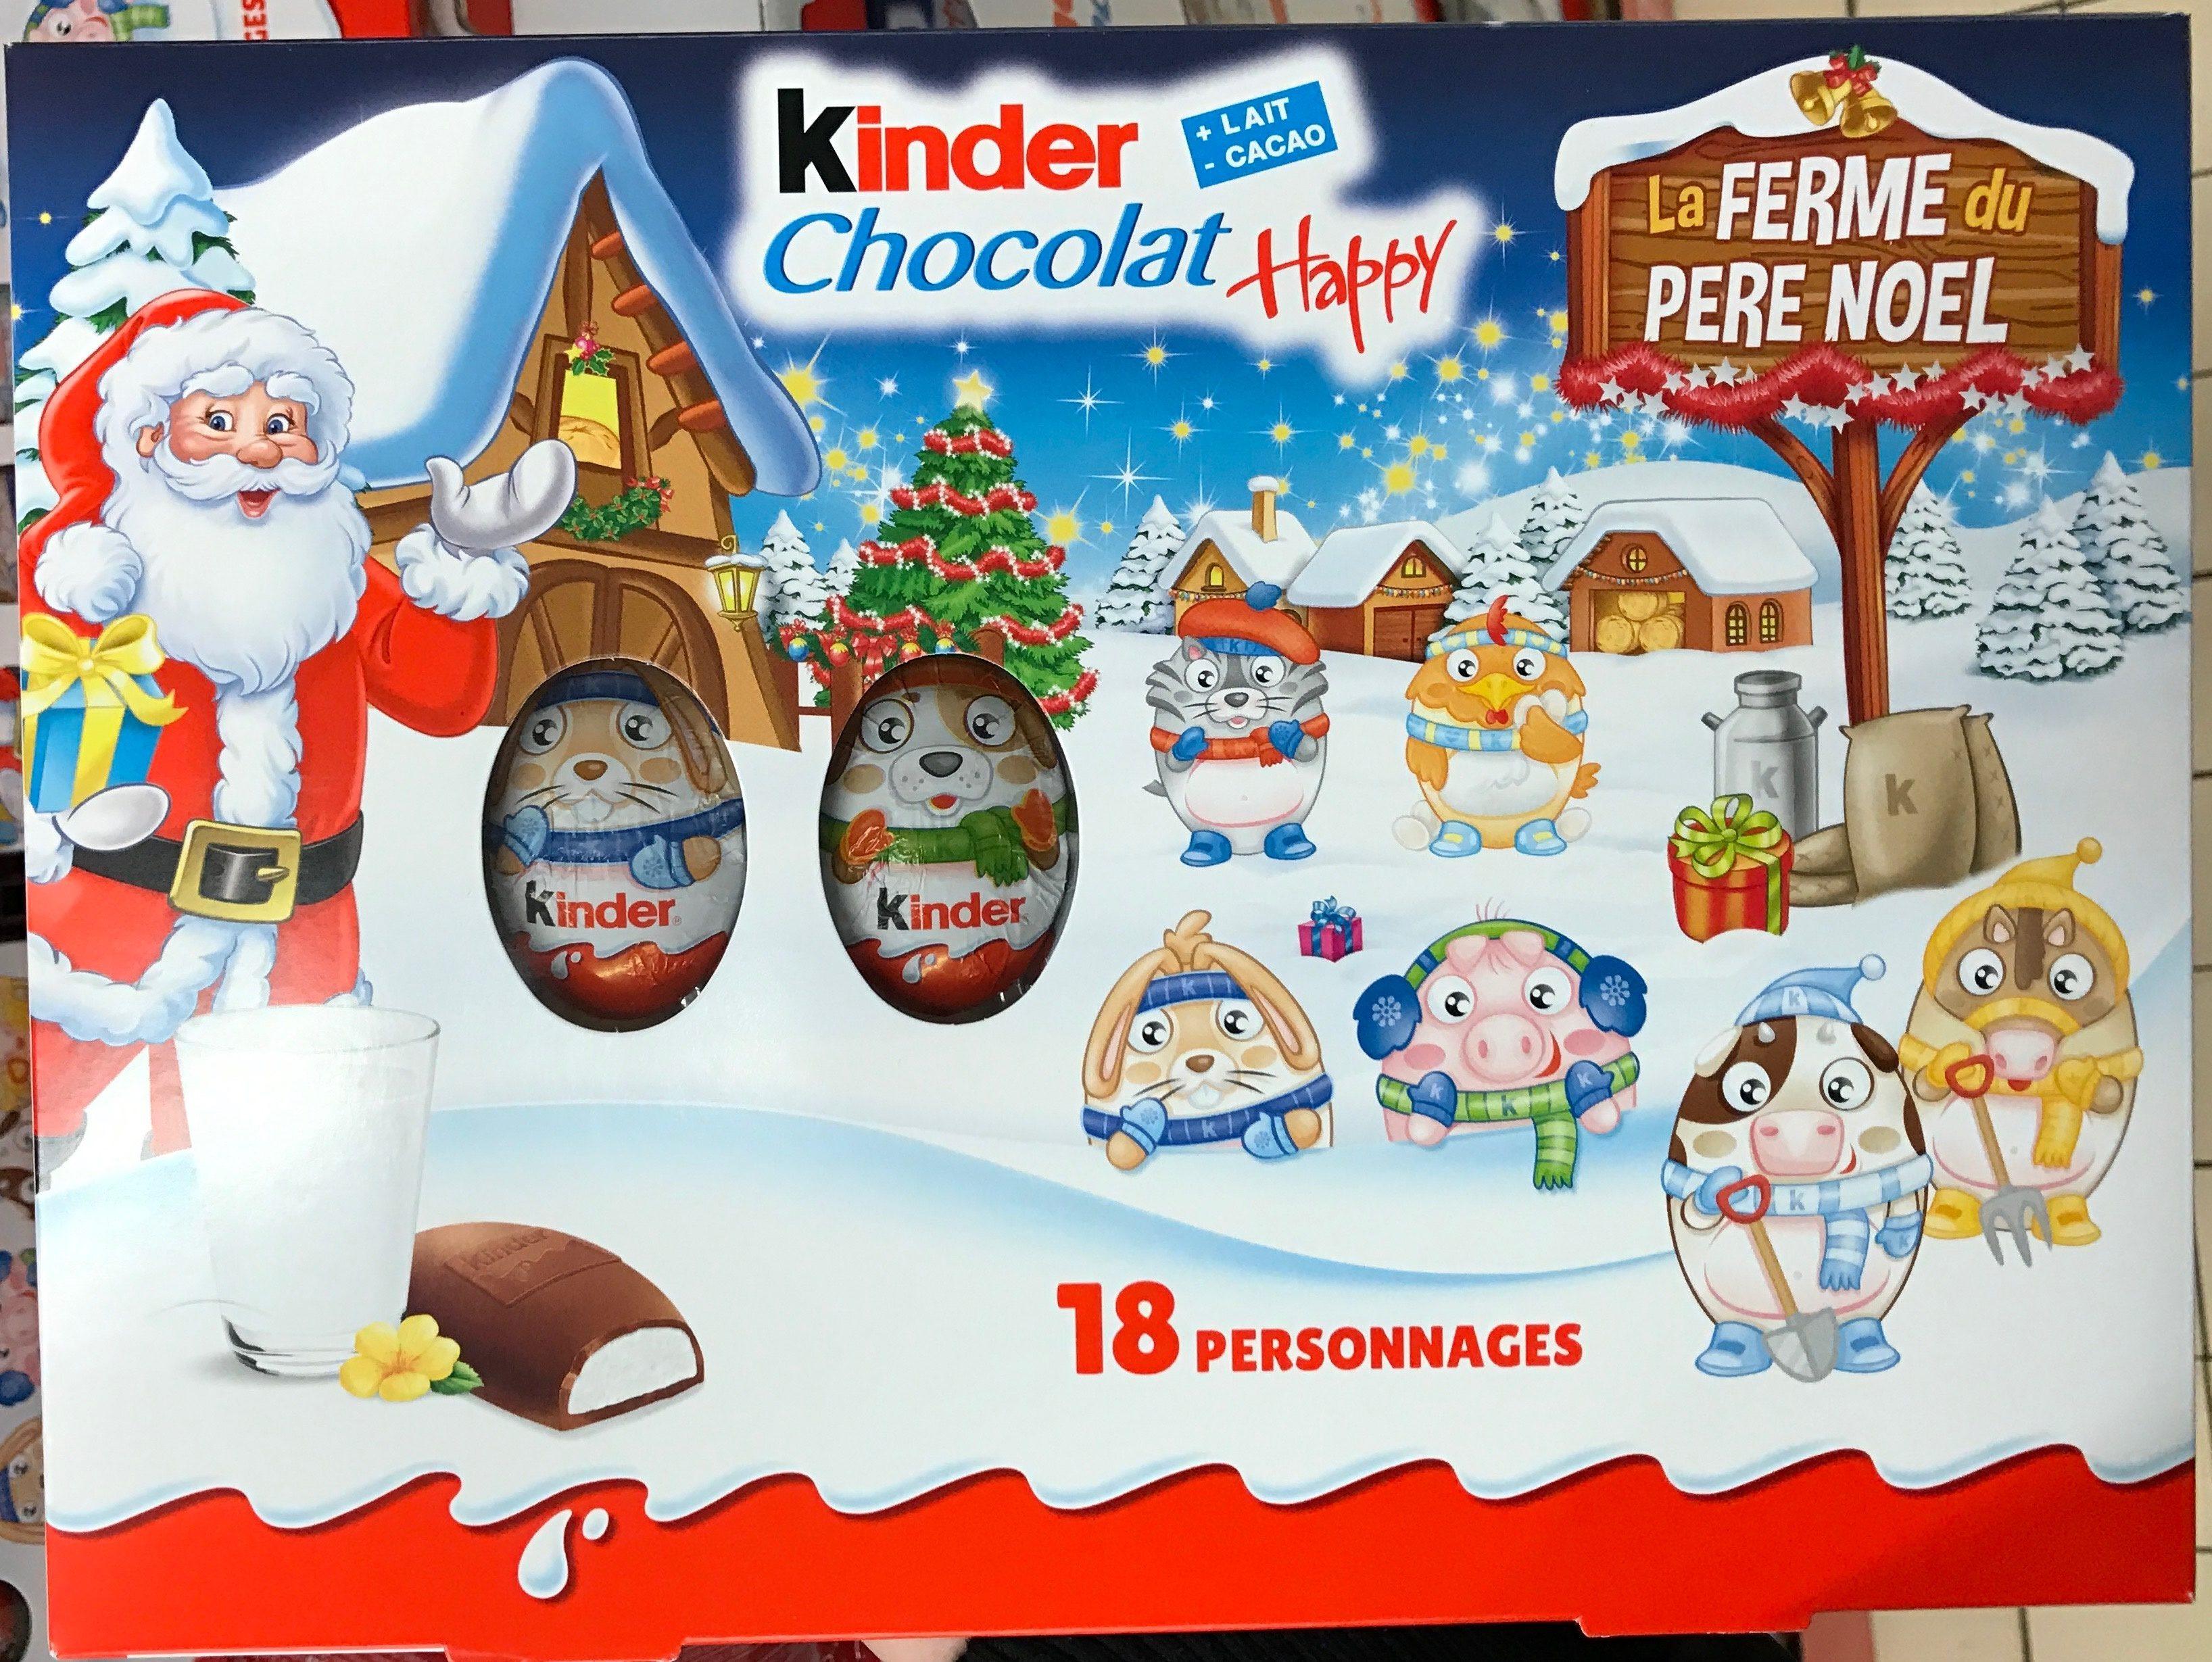 kinder noel Kinder Chocolat Happy La Ferme du Père Noël   Ferrero   153 g e kinder noel